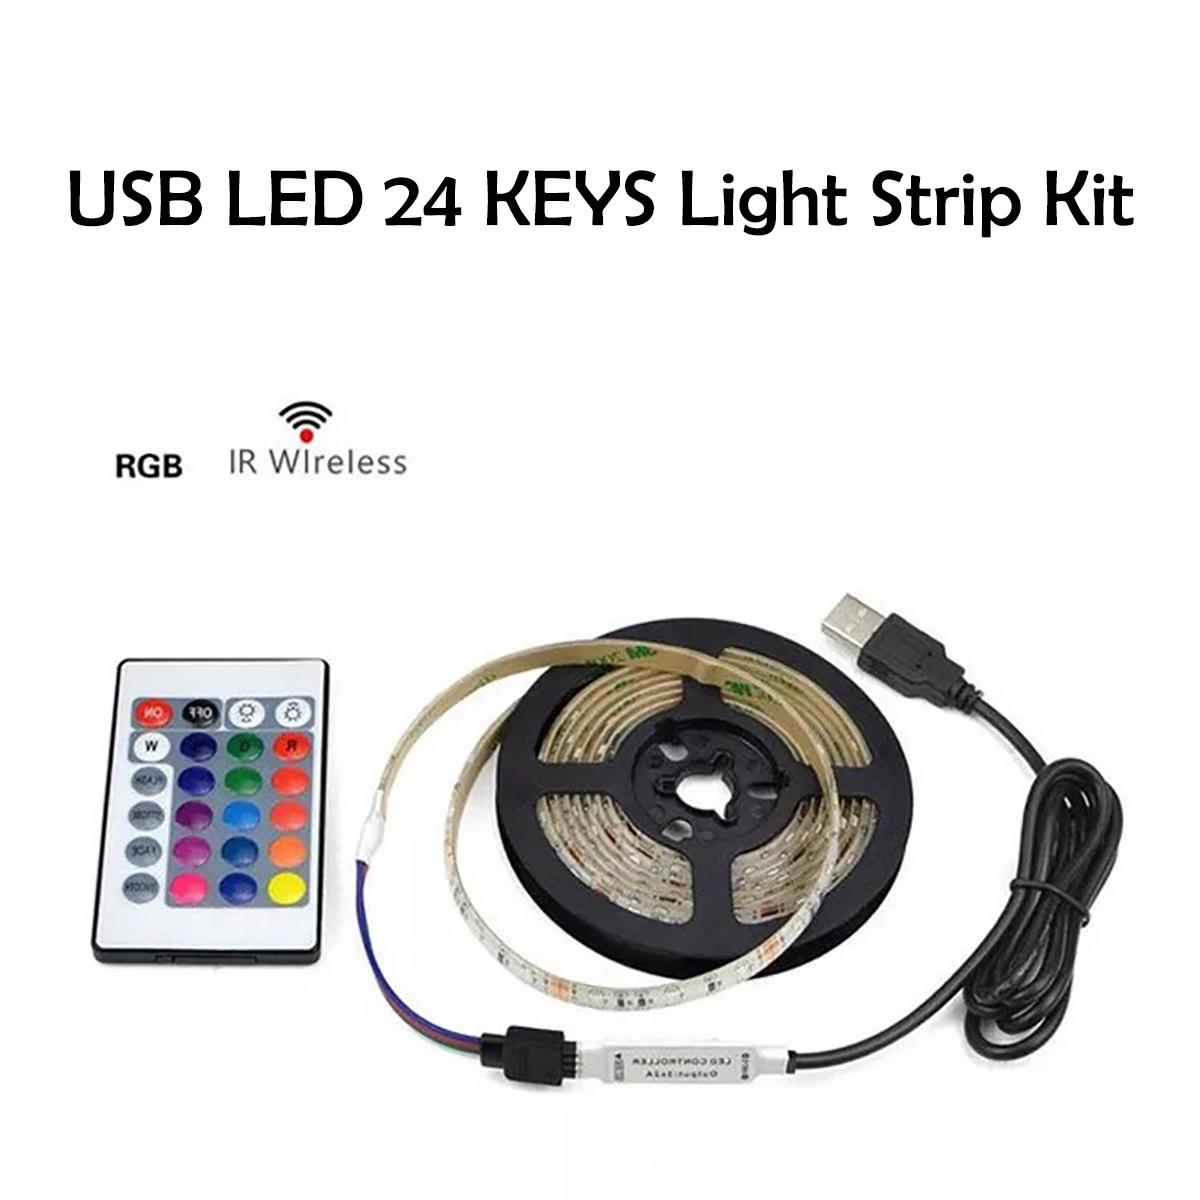 1M 2M 3M 5V 5050 USB RGB Waterproof LED Strip Light Bar TV Back Lighting + 24 Keys Remote Control